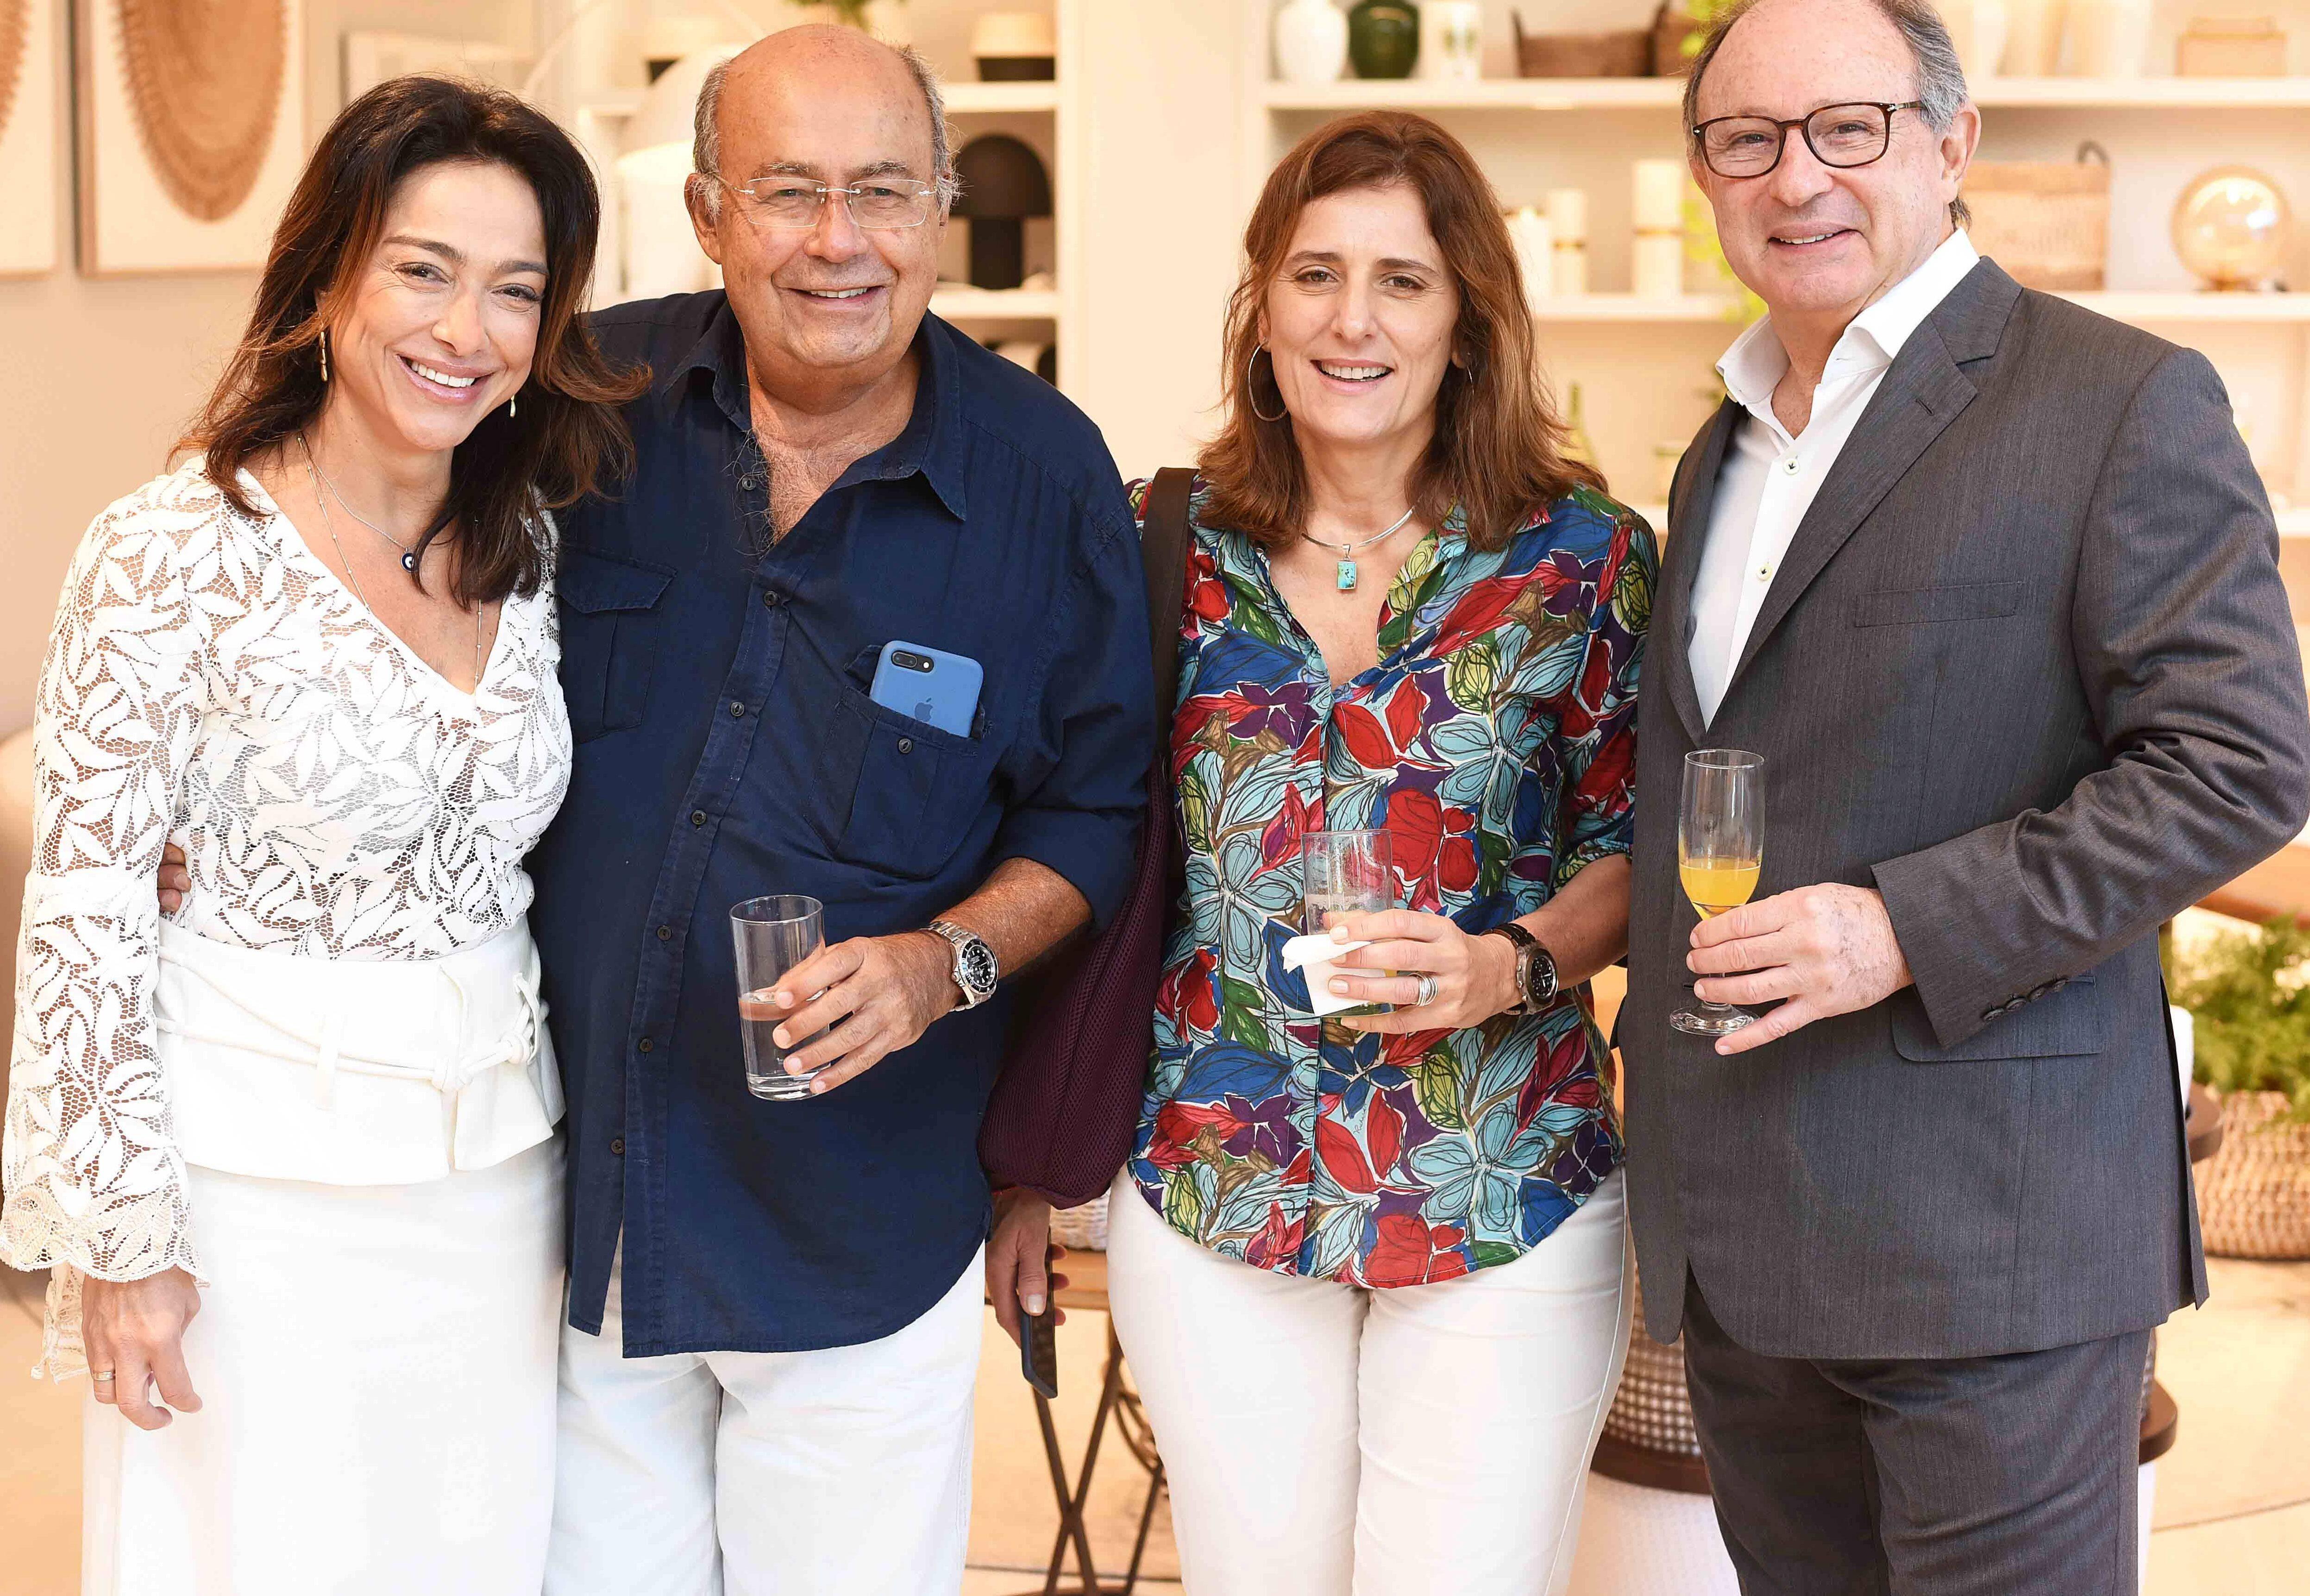 Ana Paula Iespa, Heitor Derbli, Andrea Eboli e Marcel Rivkind/ Foto:  Ary Kaye